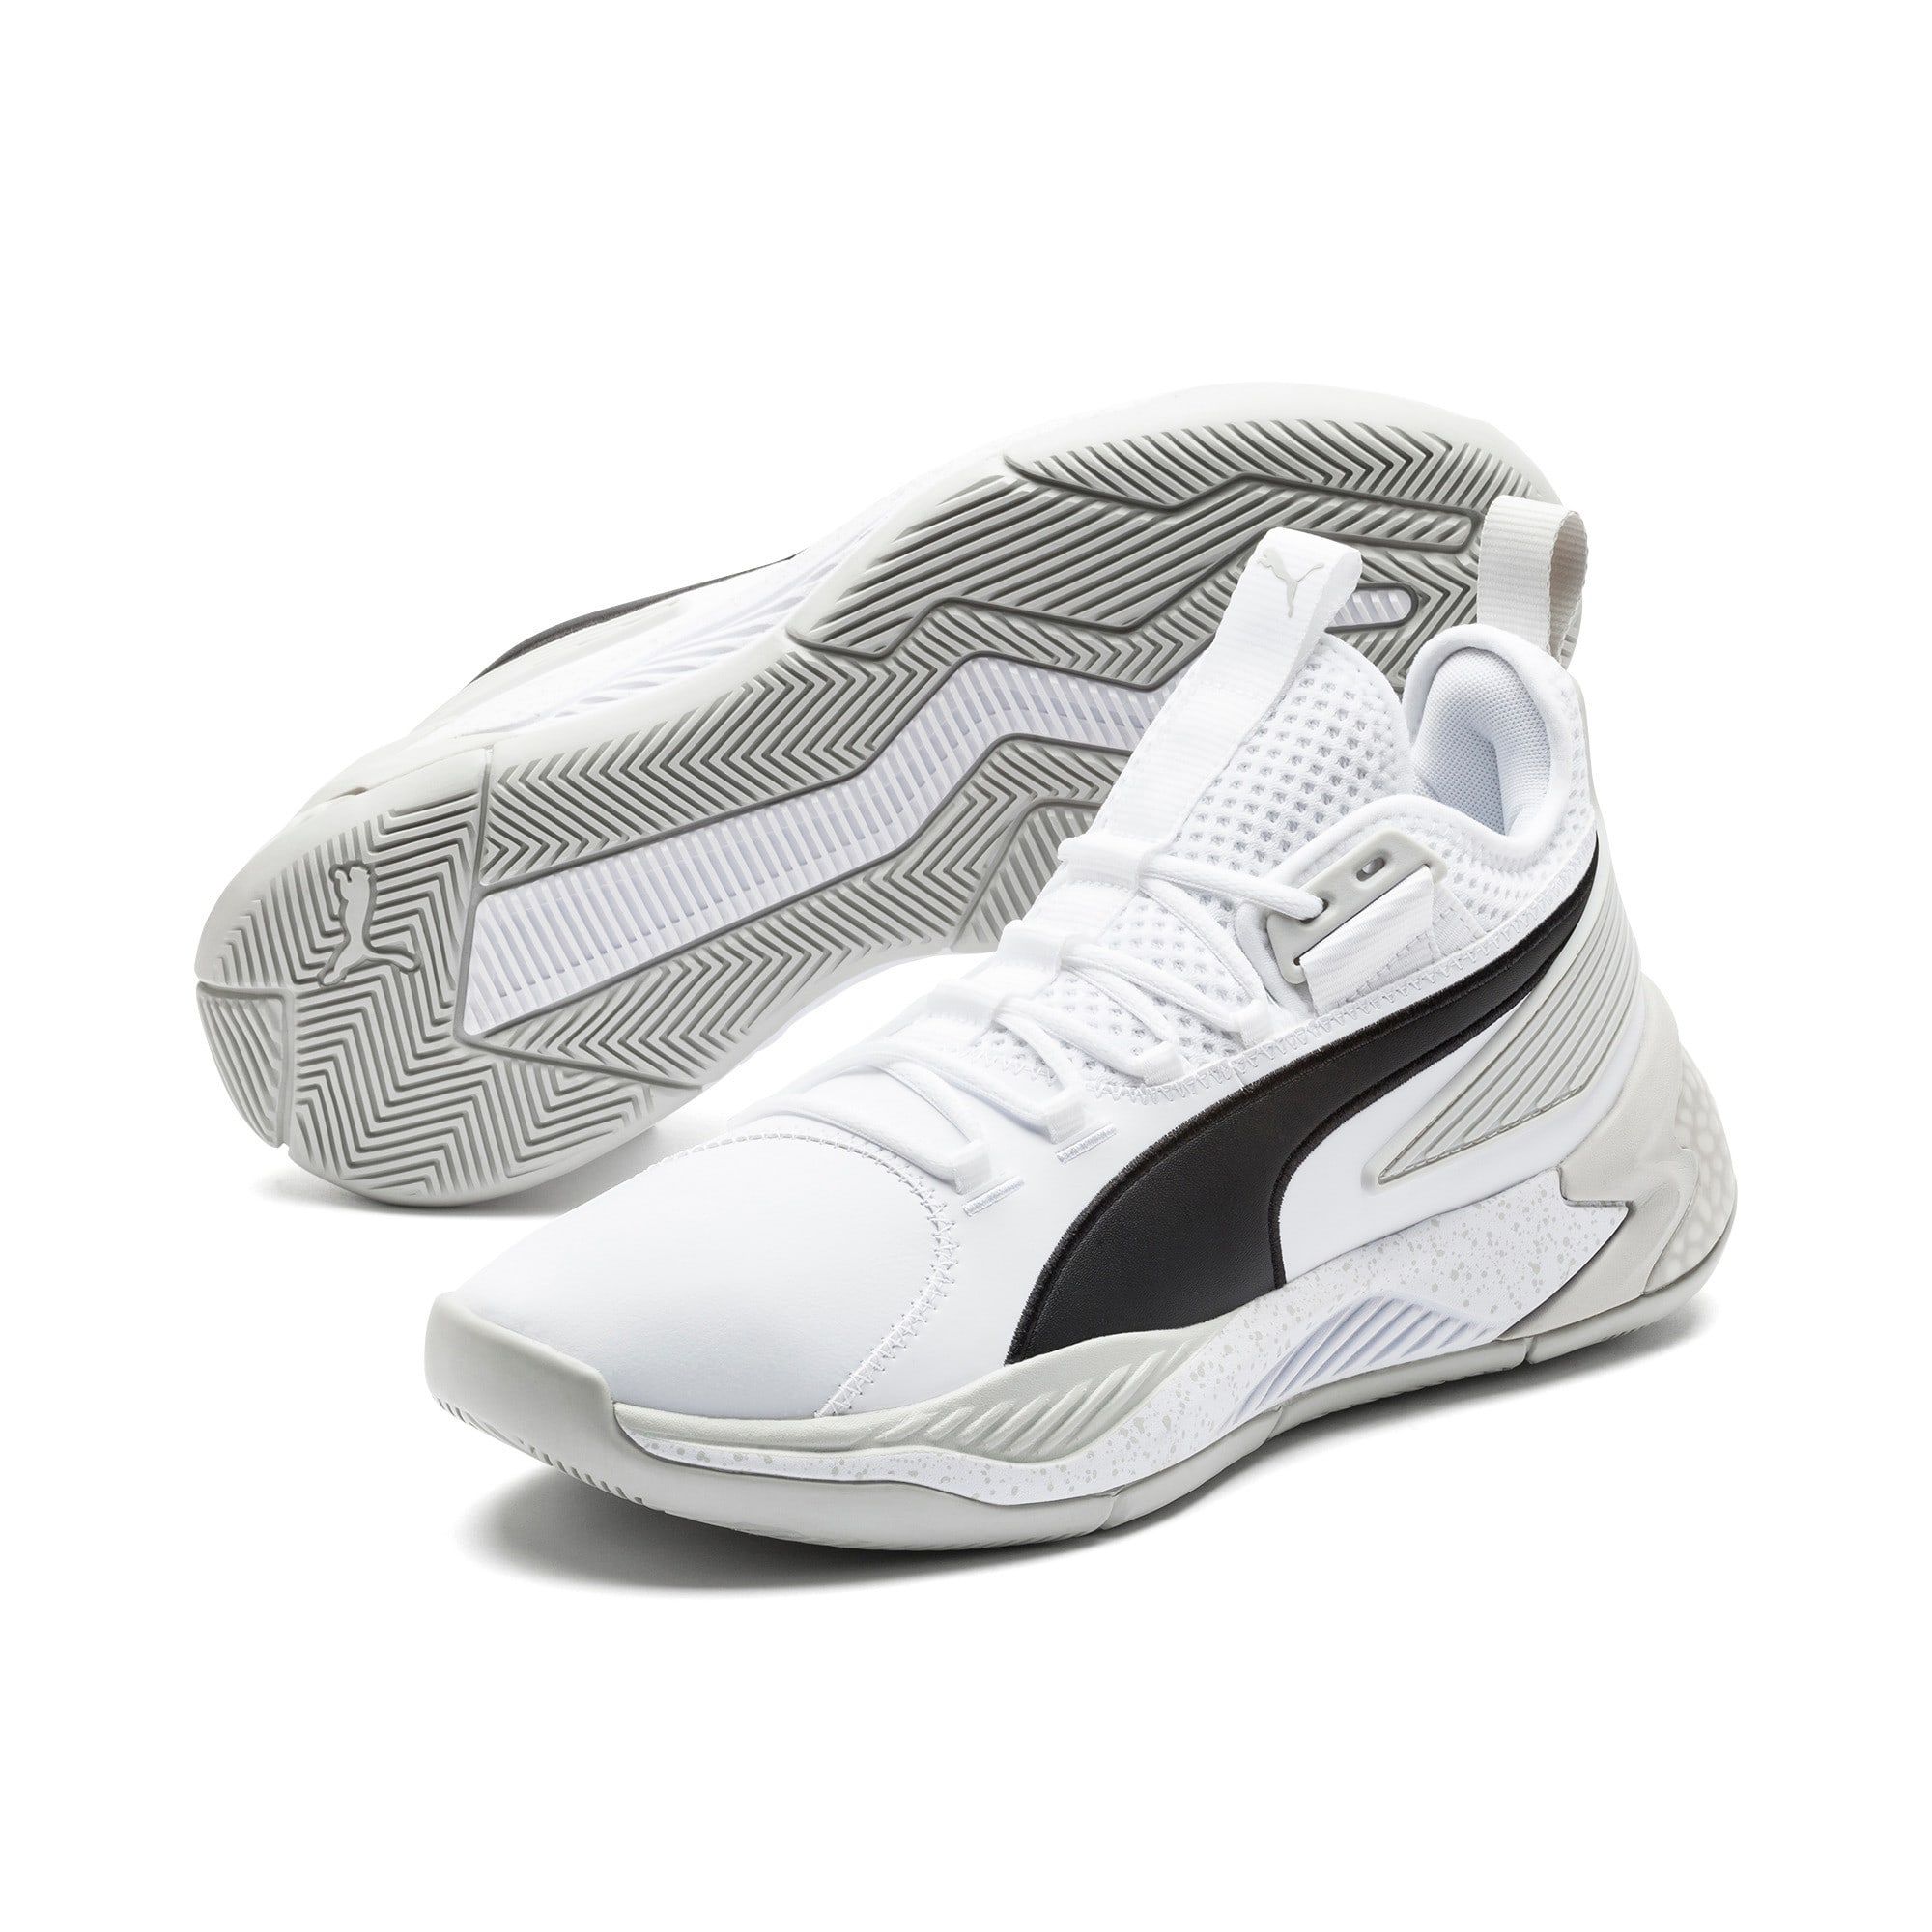 Thumbnail 2 of Uproar Core Men's Basketball Shoes, Puma White-Glacier Gray, medium